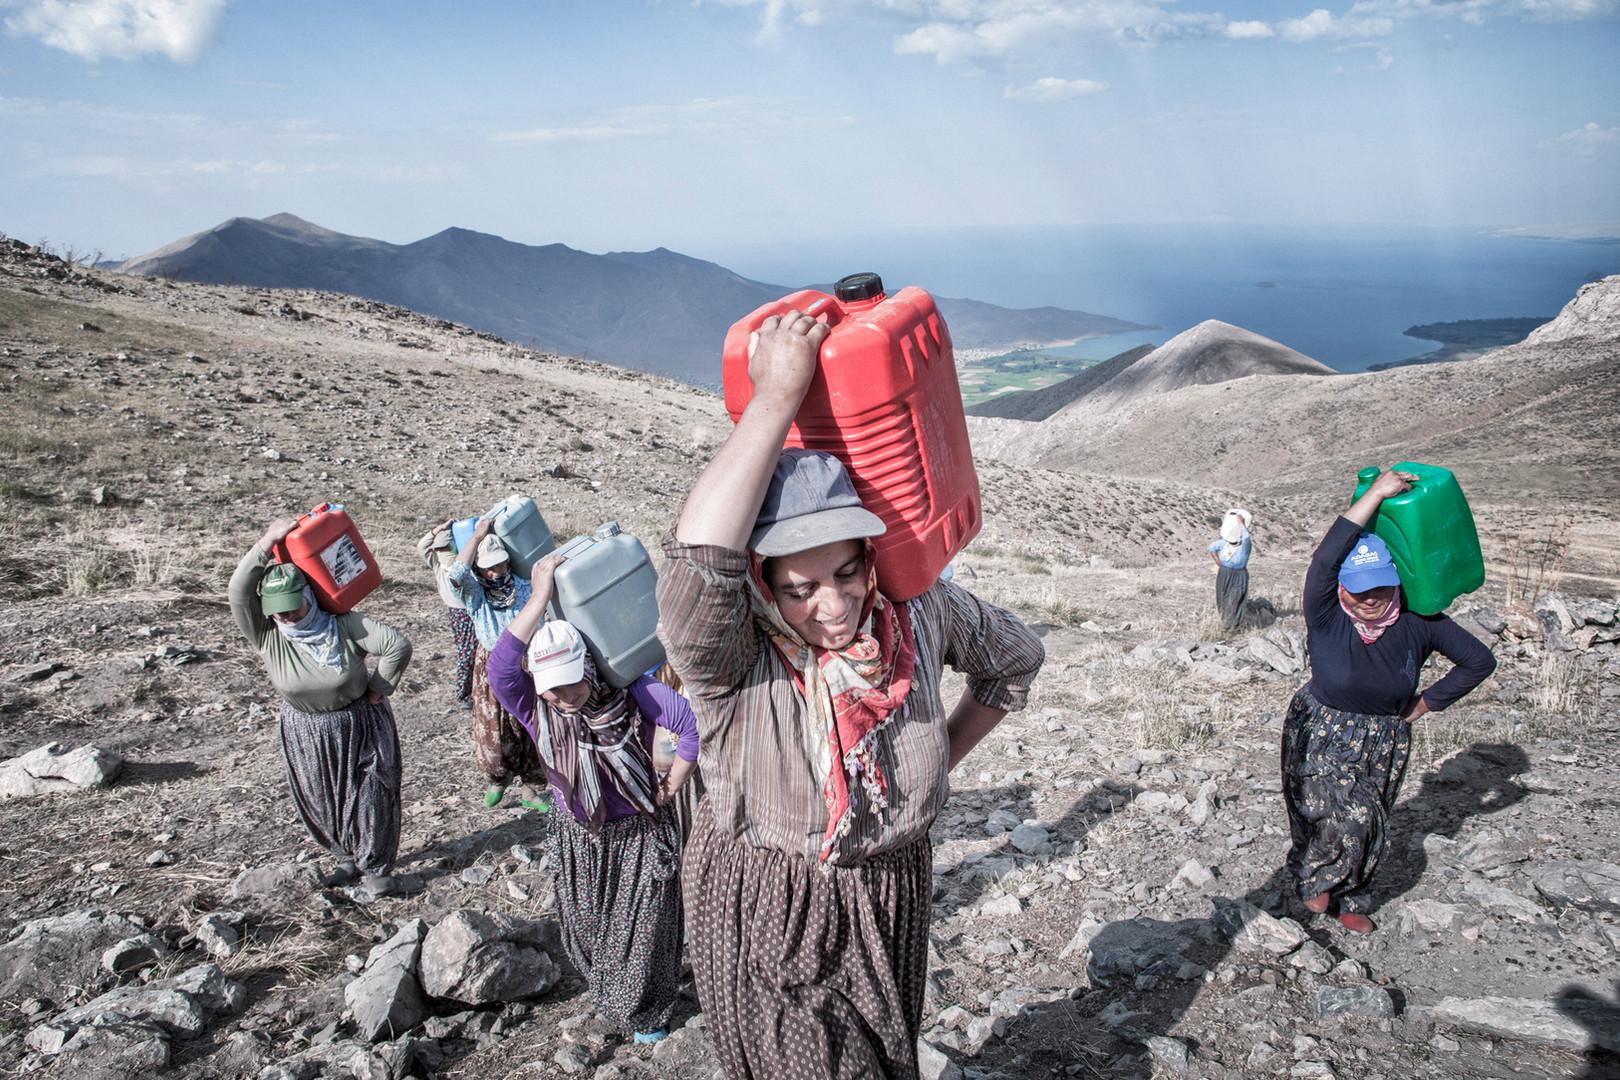 The herdswomen carry bins filled with milk. Mir Plateau, Van, August 2011.